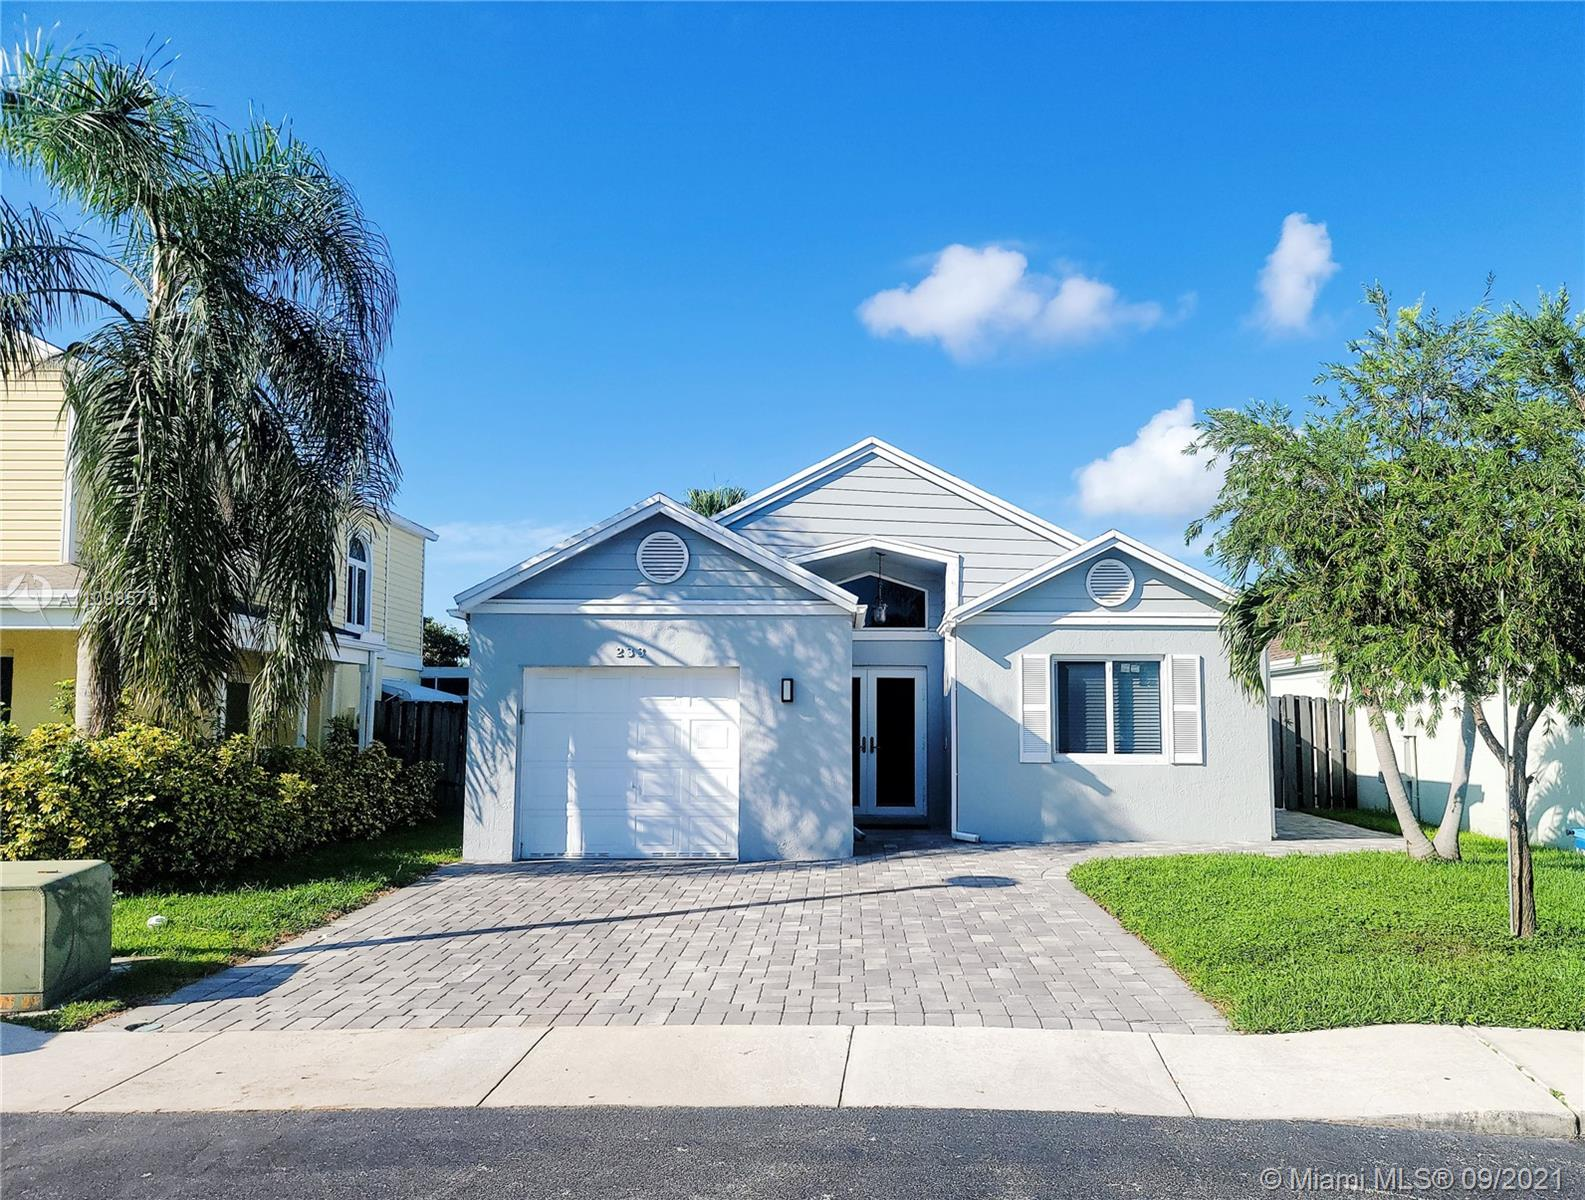 233 159th Way, Sunrise, Florida 33326